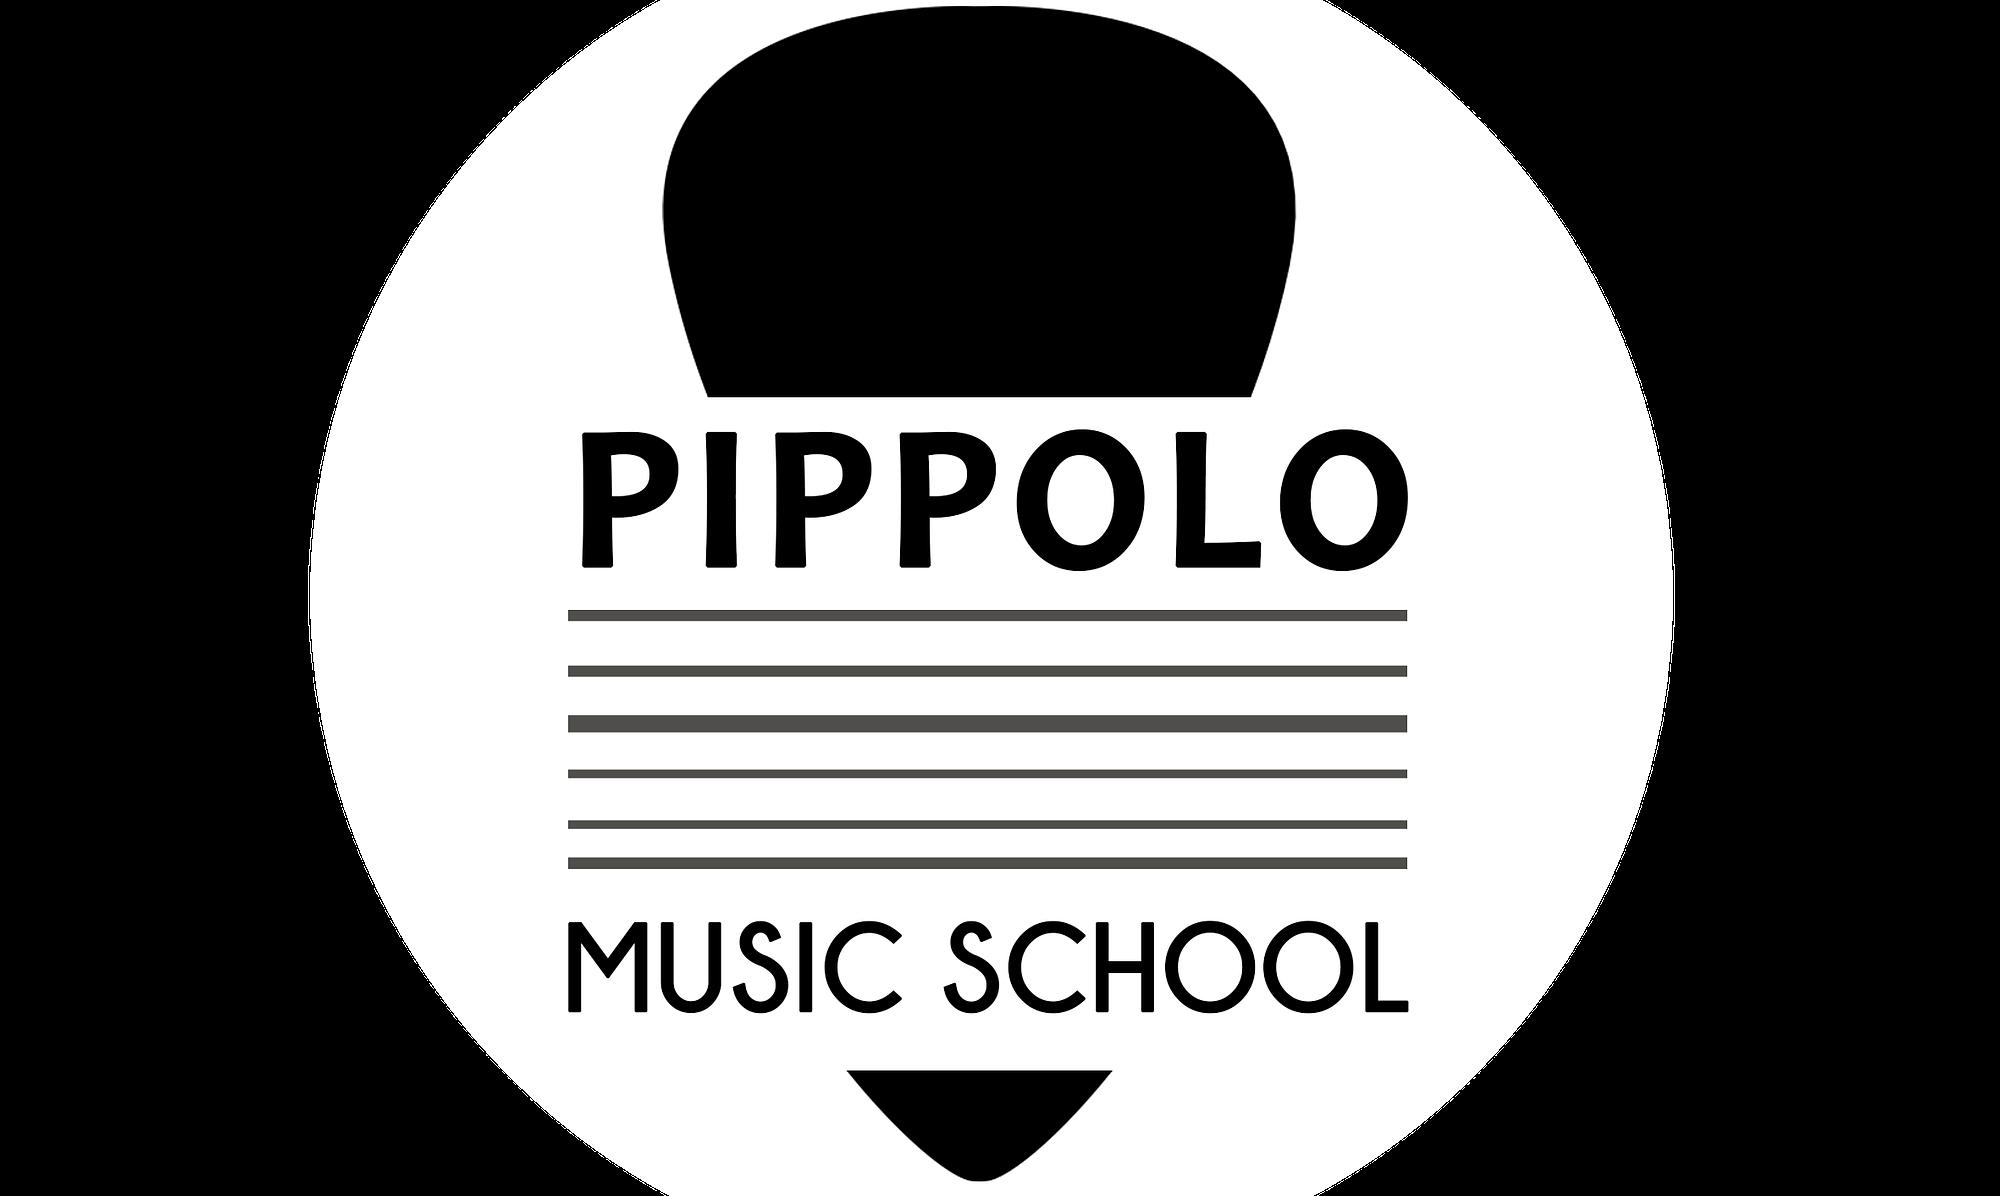 Pippolo Music School